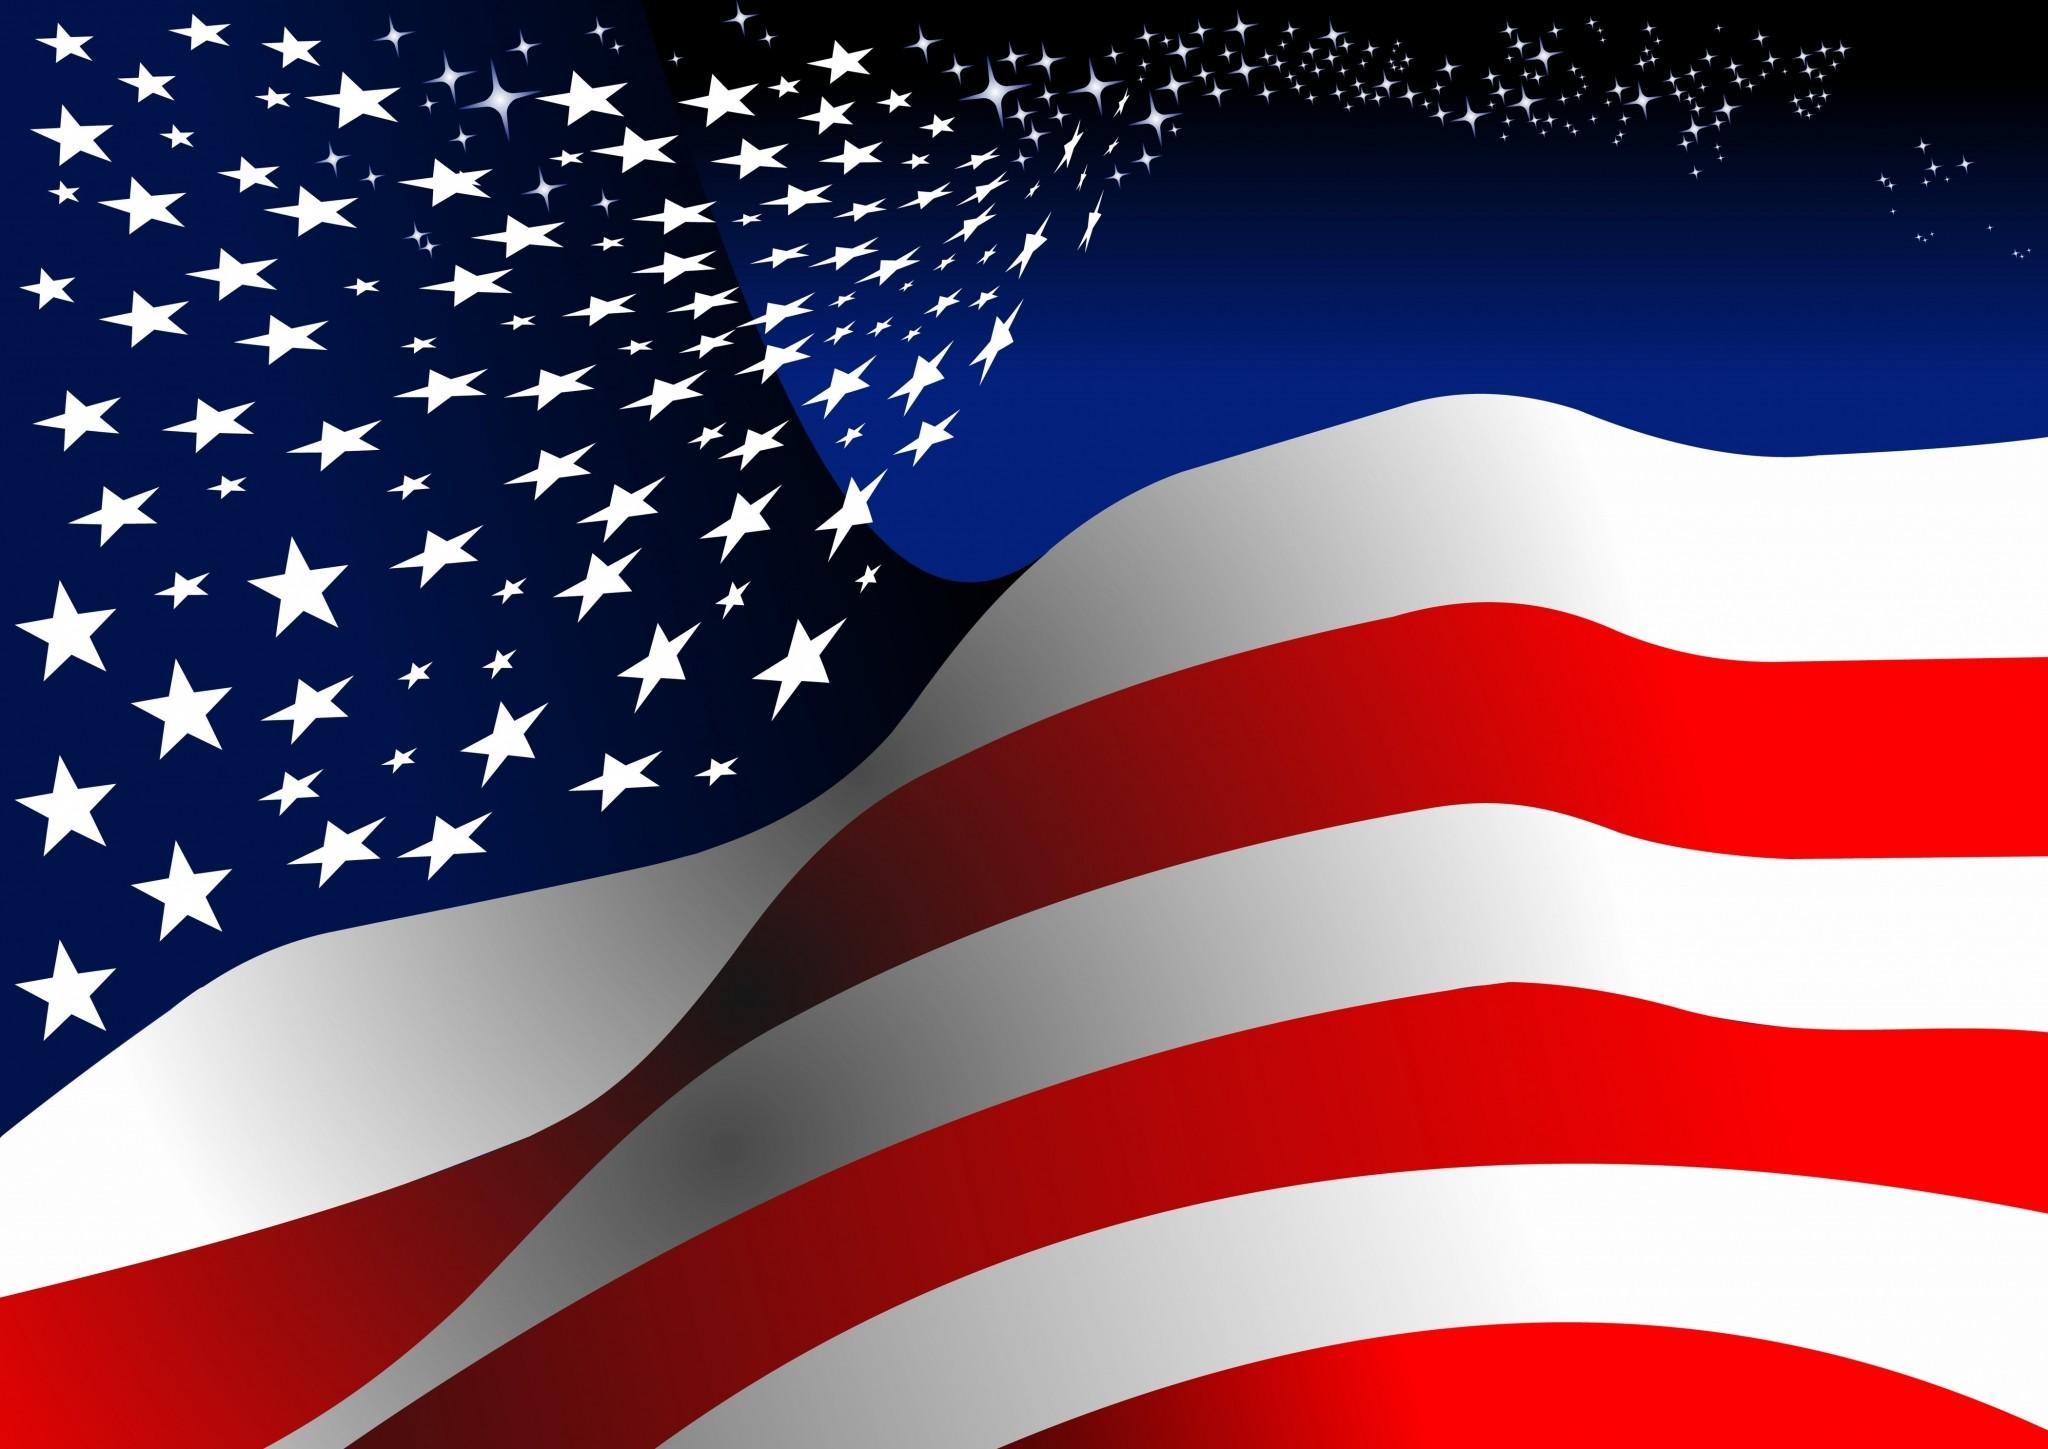 american flag best wallpapers free